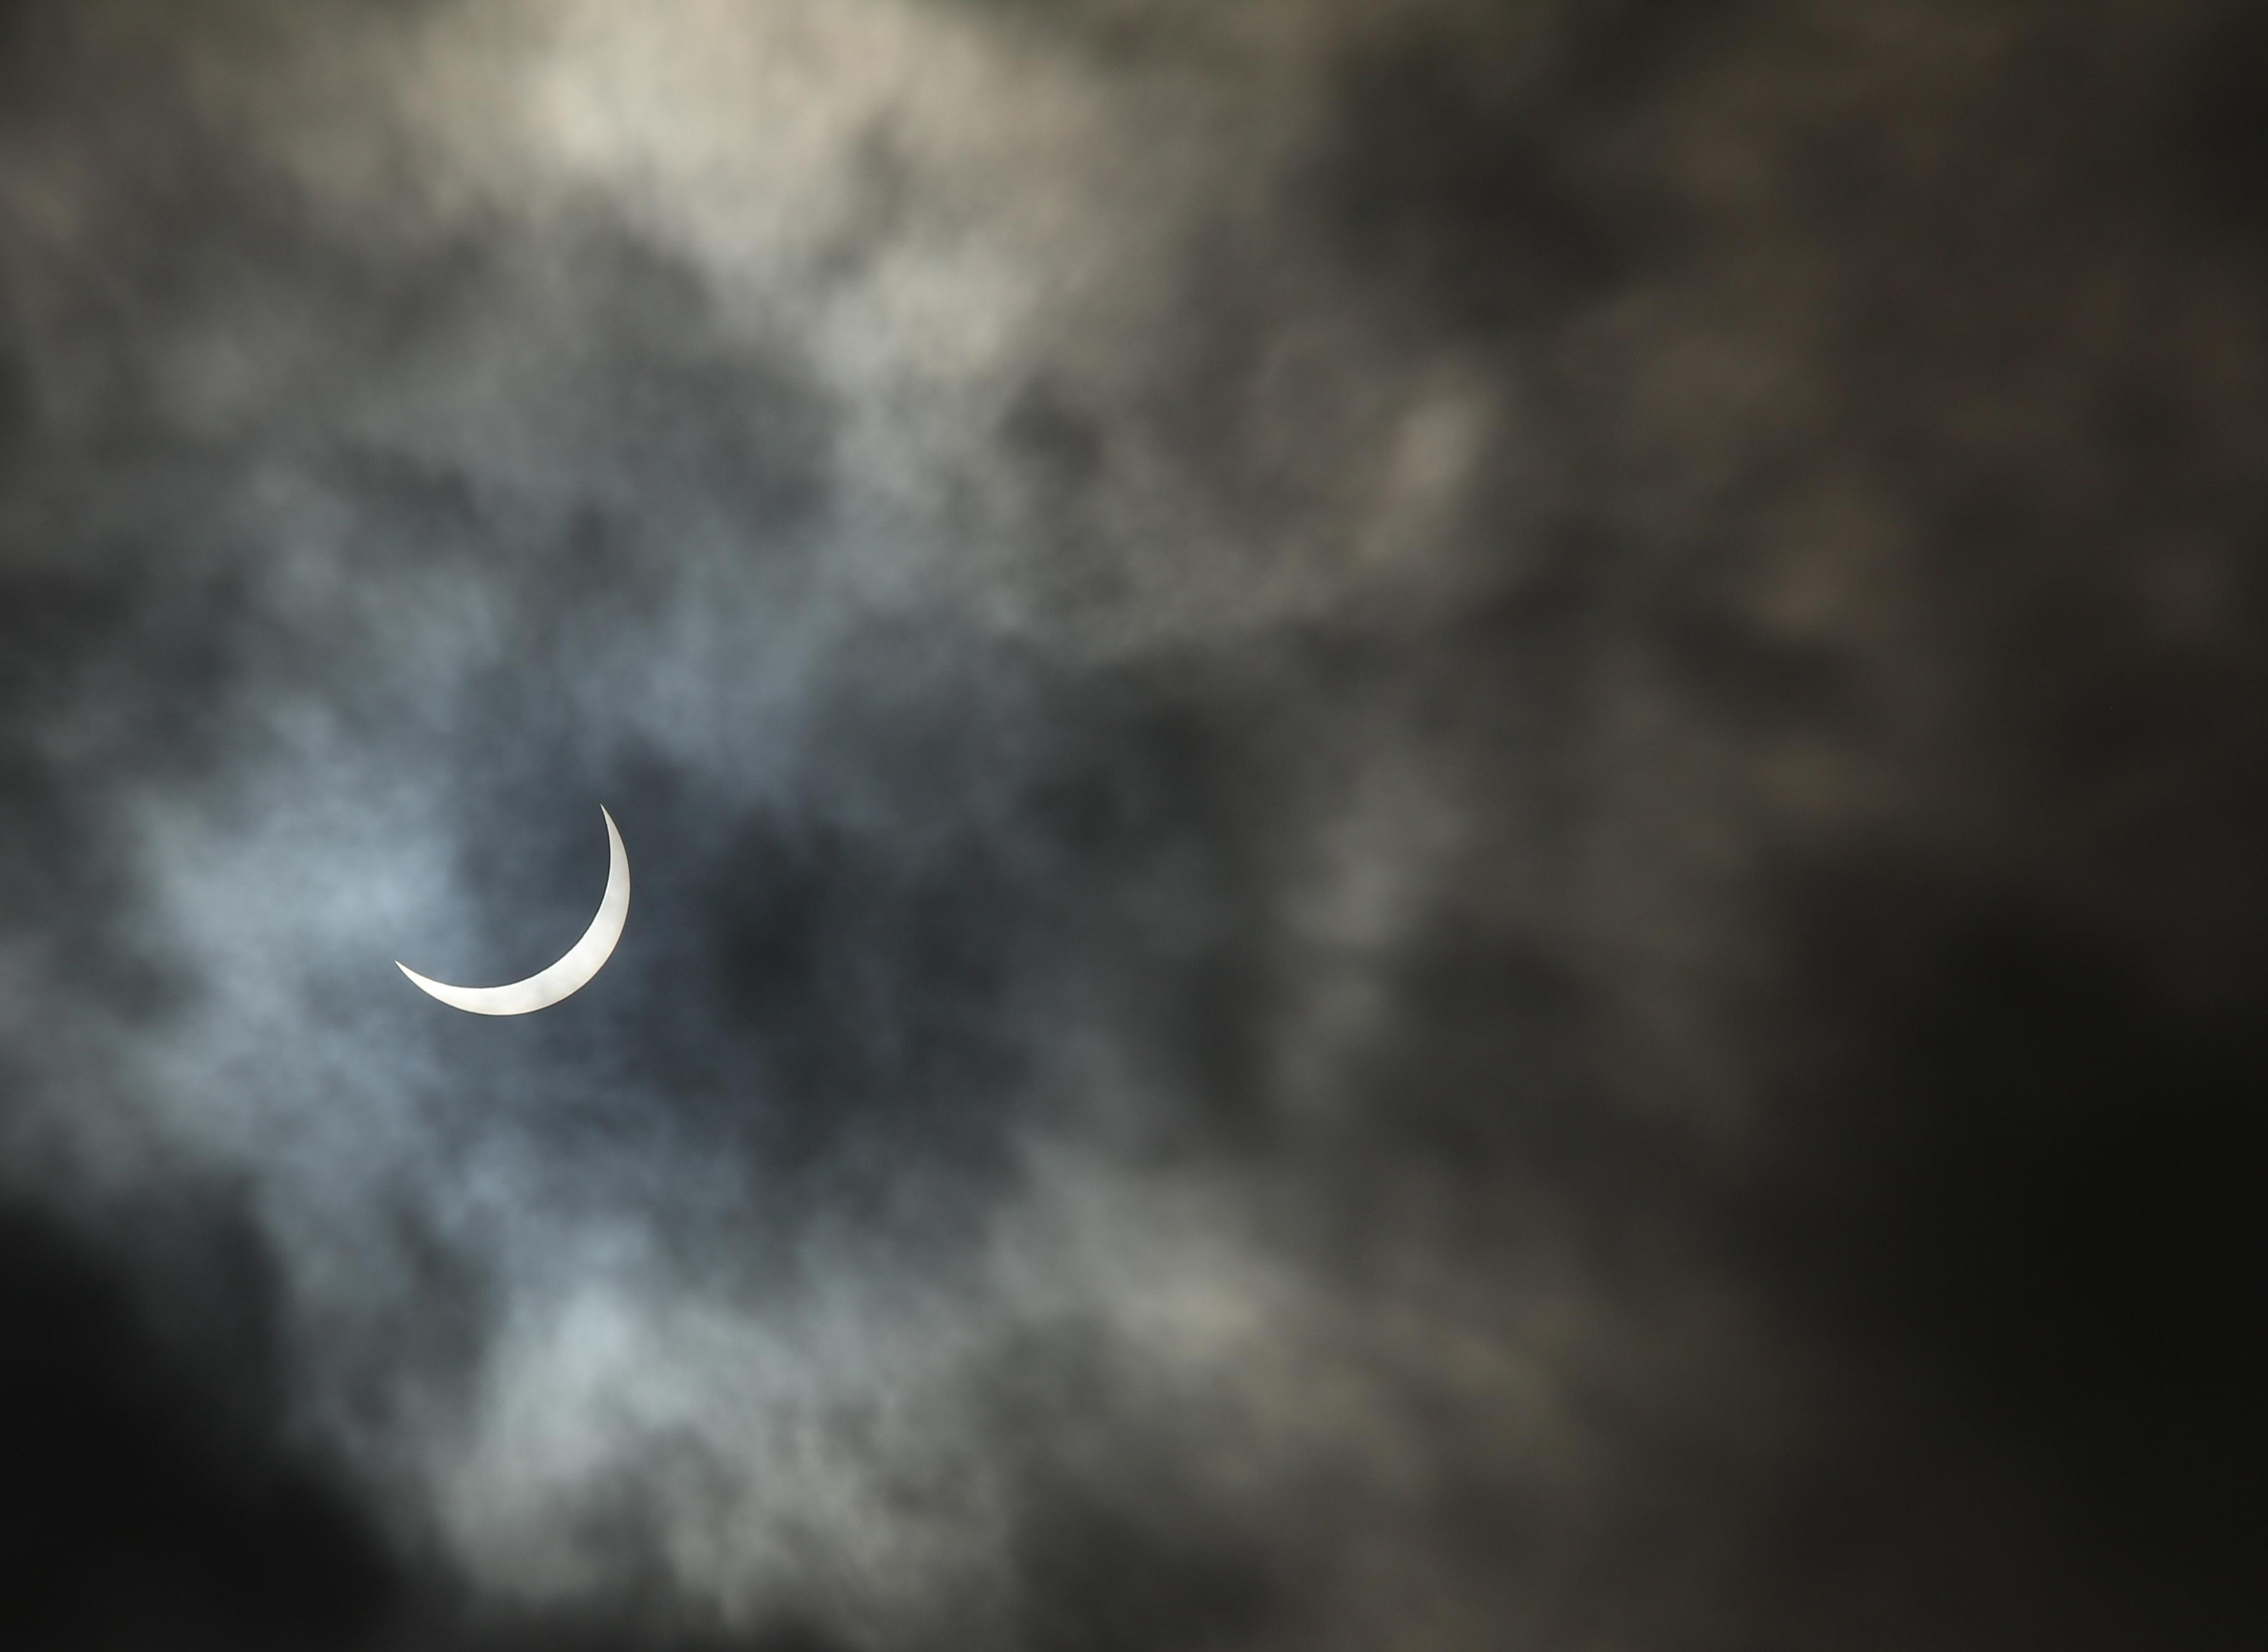 Solar Eclipse ~ August 21, 2017